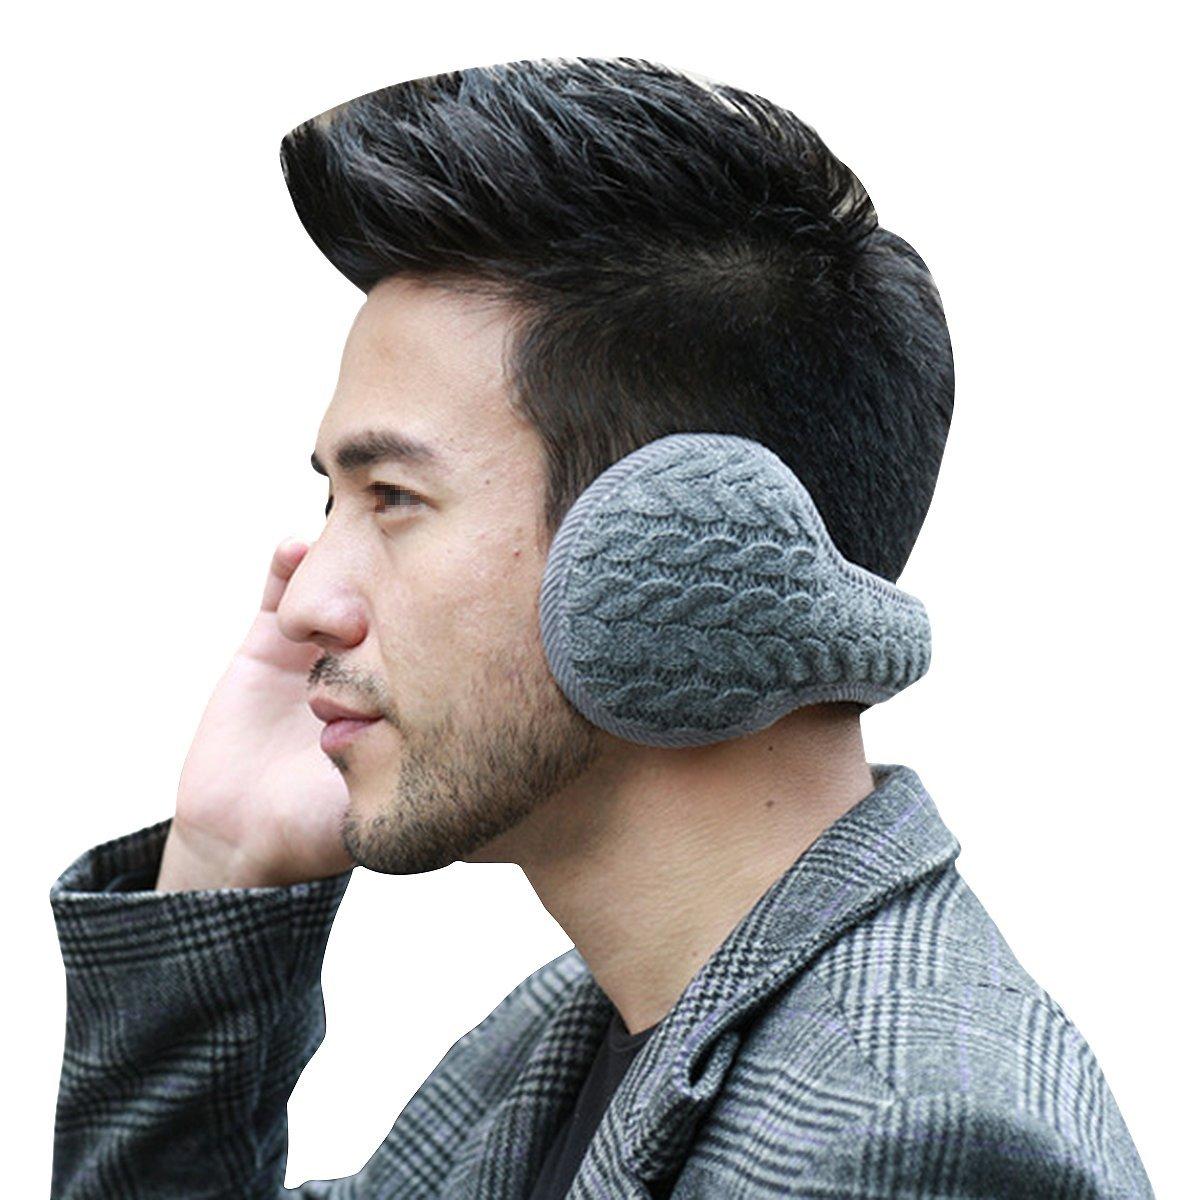 Butterme Unisex Winter Warm Knitted Ear Cover Soft Plush Earmuff for Outdoor,Ski,Party(Grey) ZUMUii ZUMU00002402